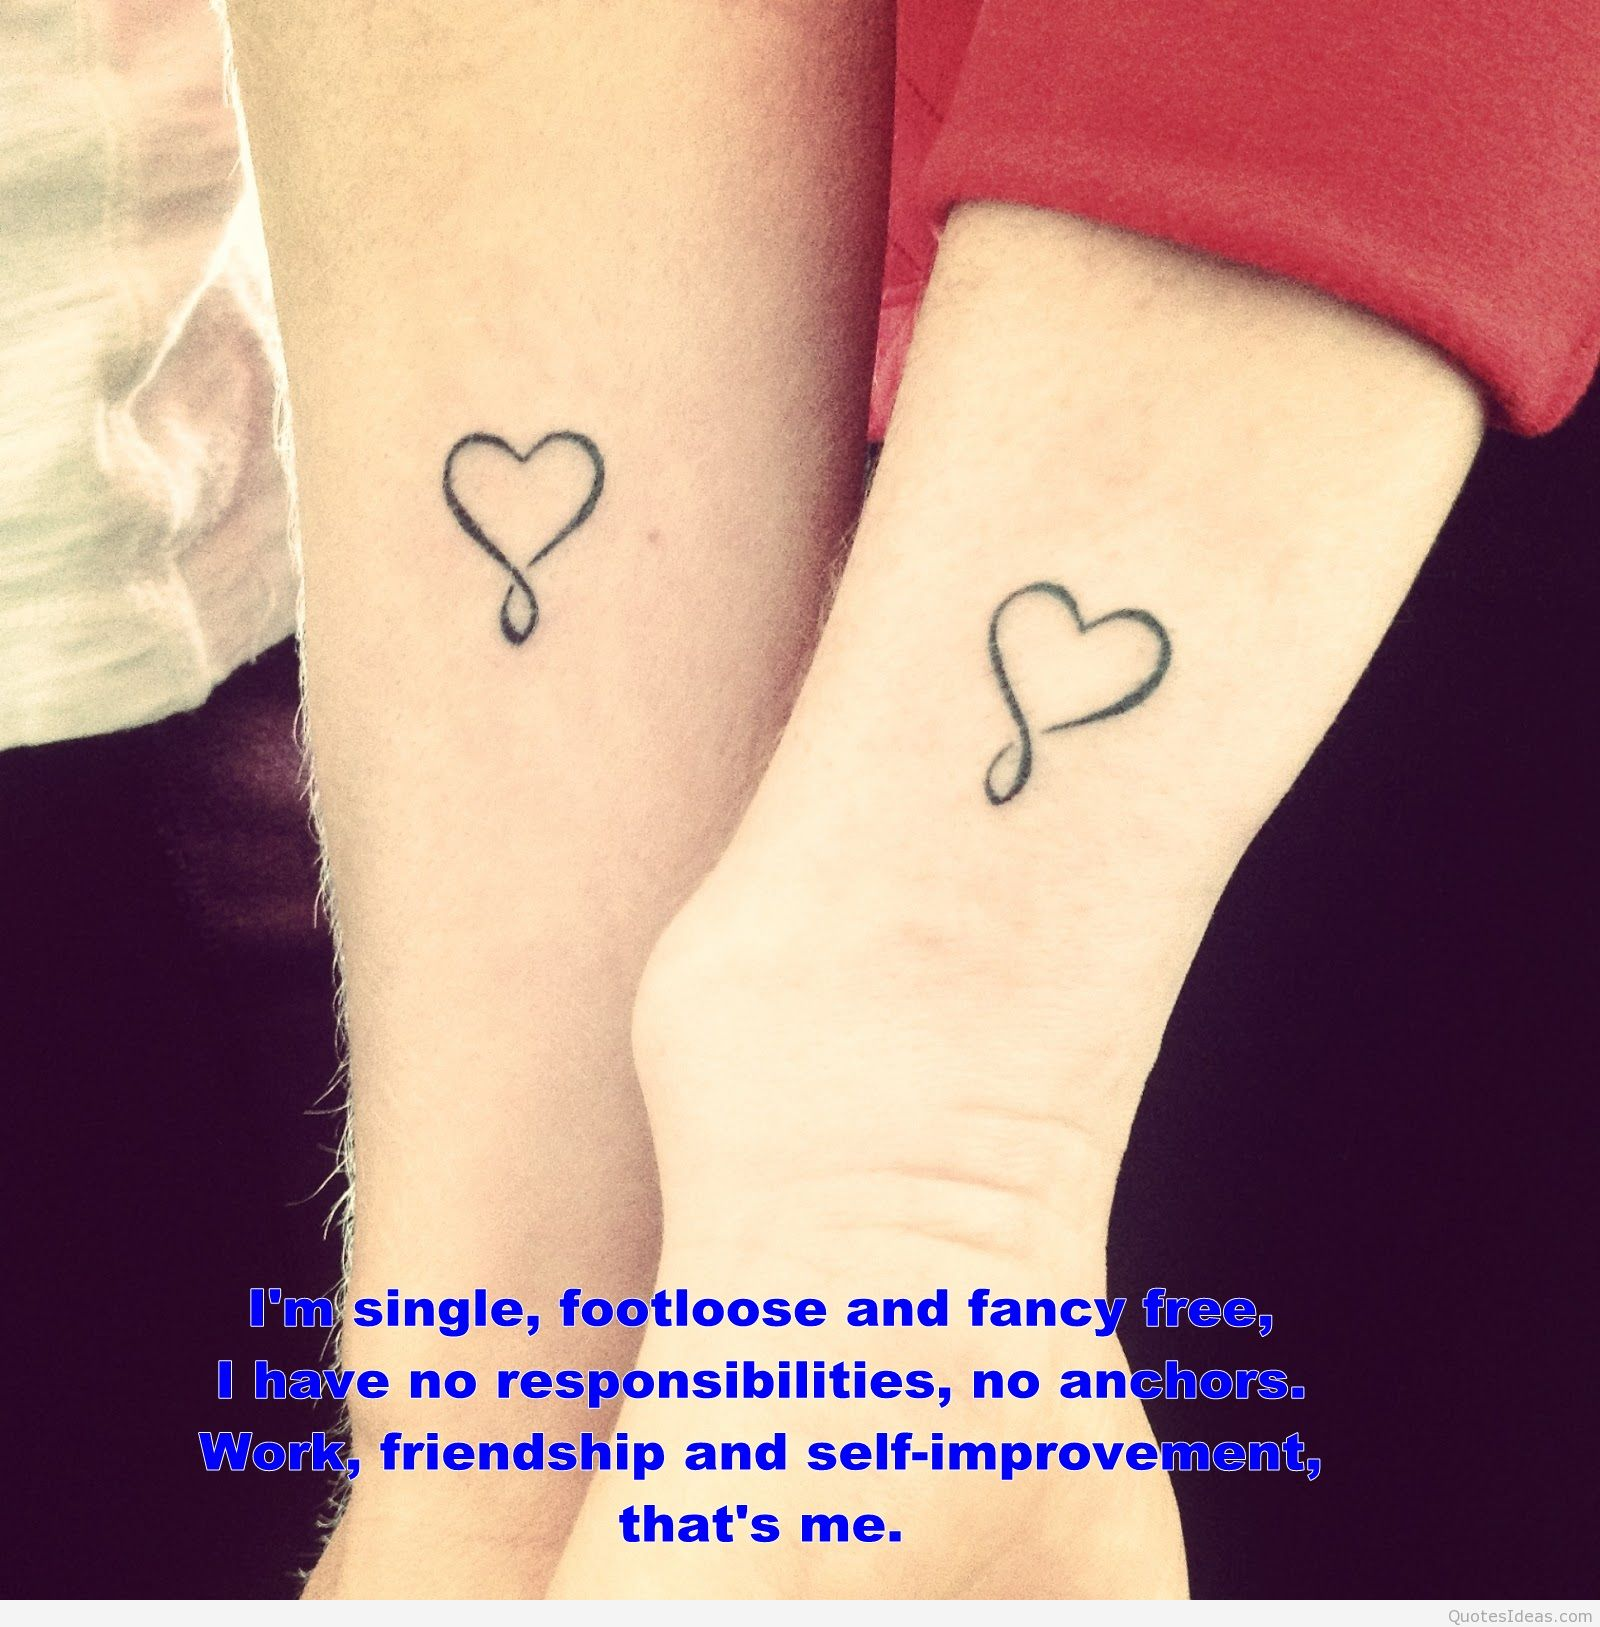 Best friend quotes on instagram : Best friend quotes for instagram quotesgram